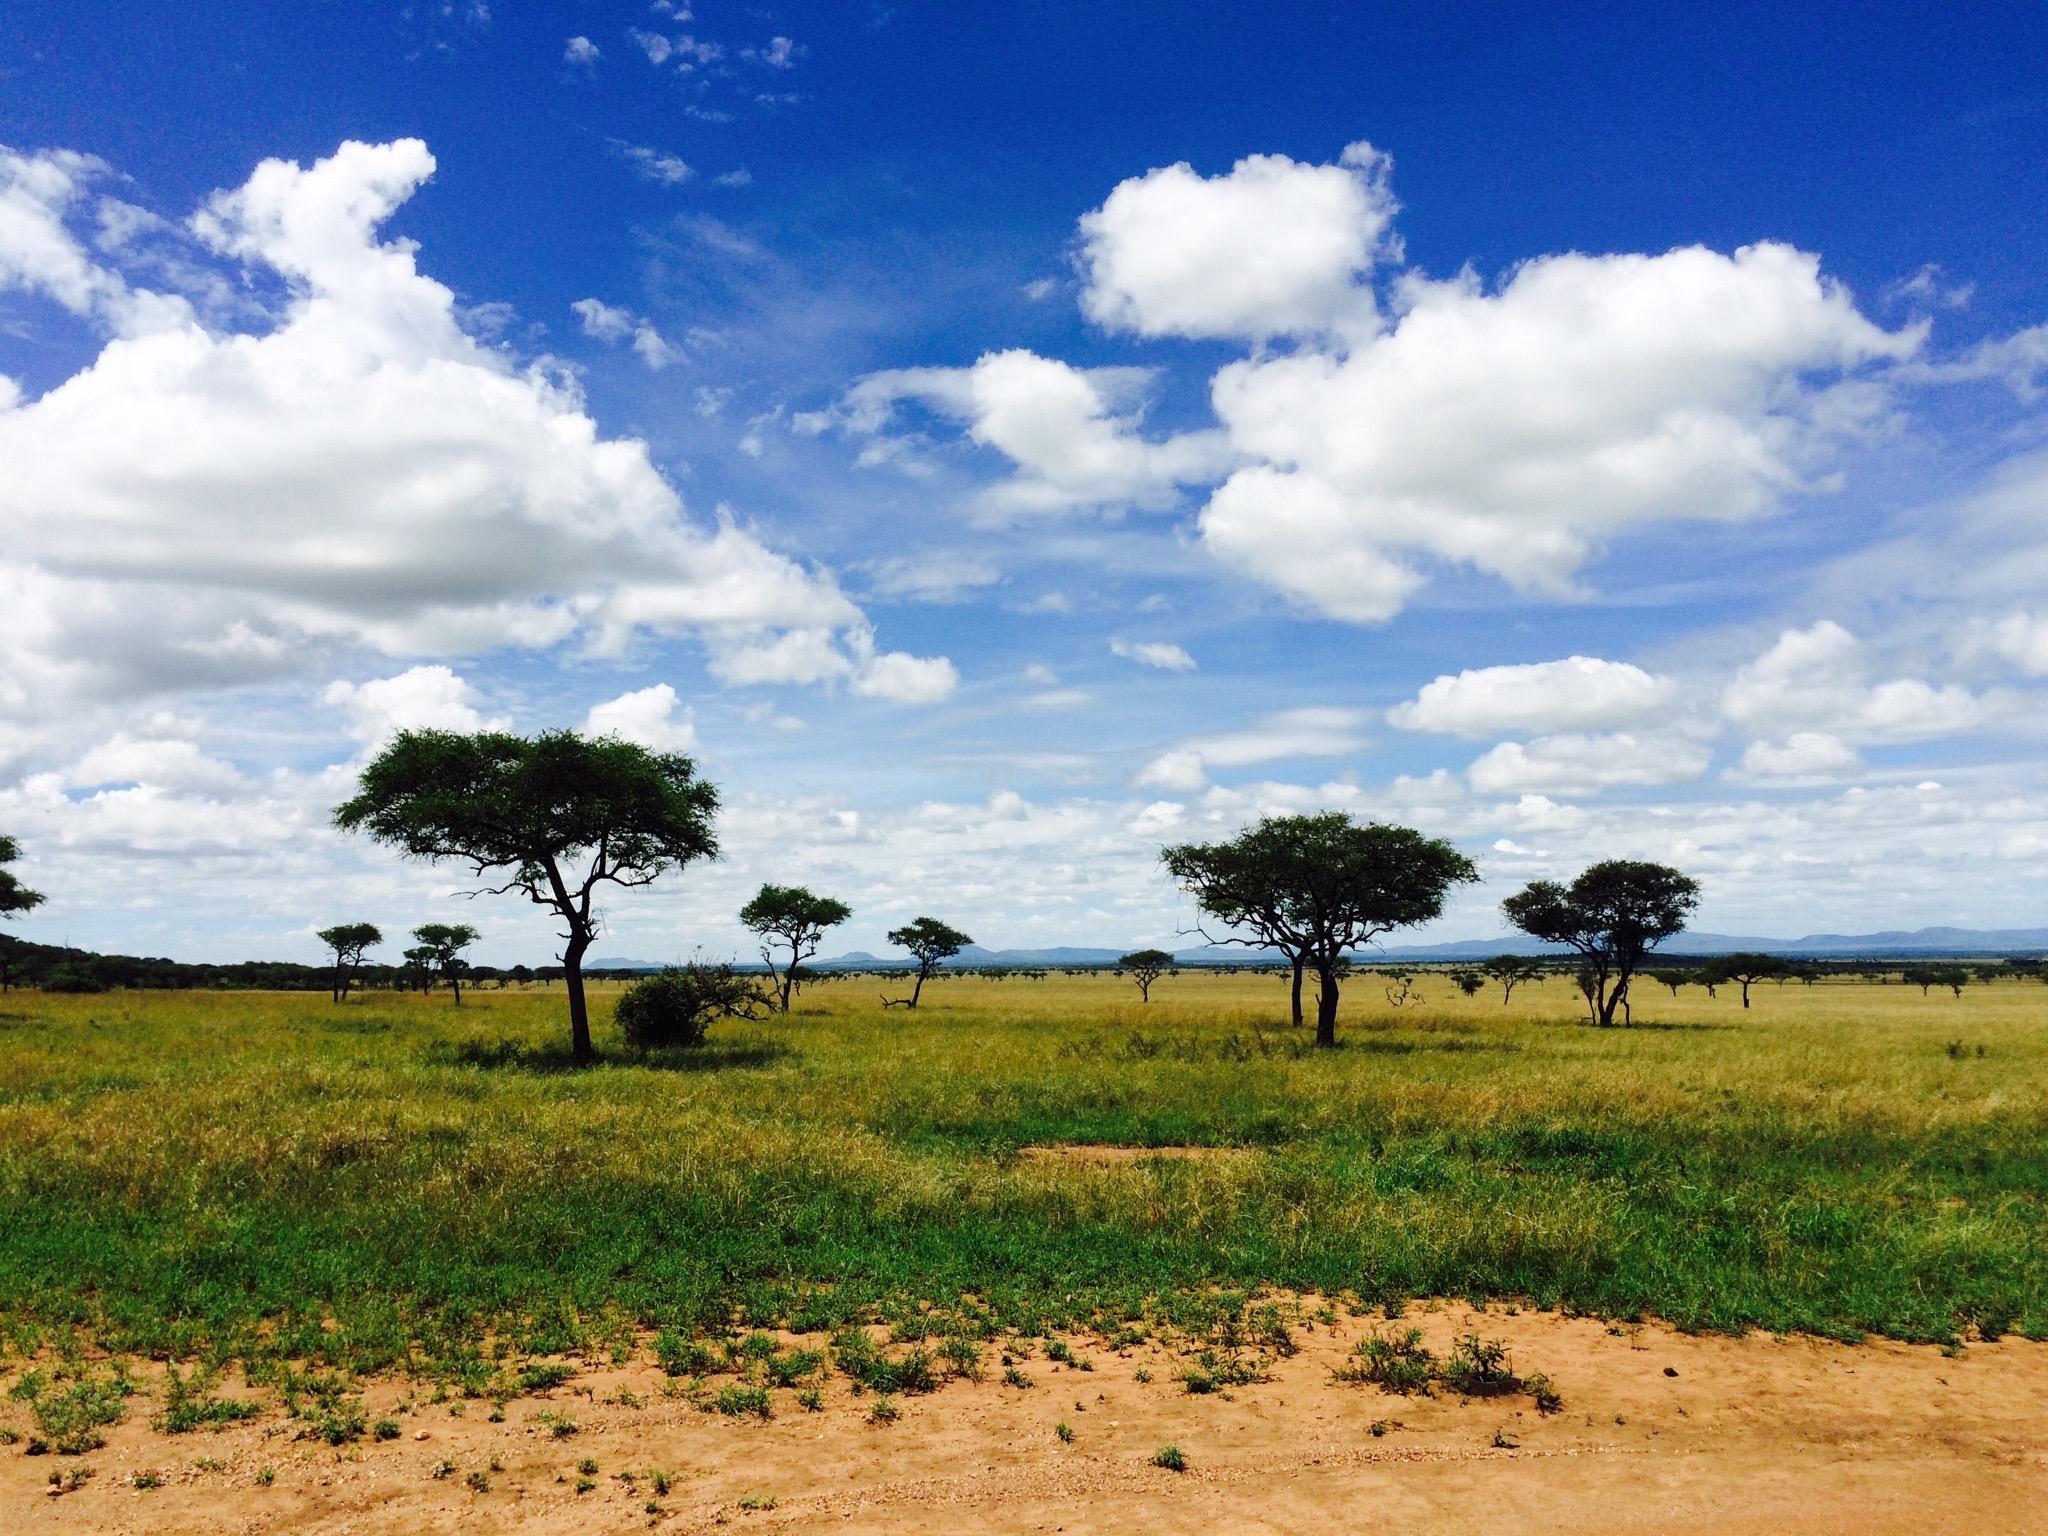 Rwanda Gorilla Safari and the Great Migration in Tanzania